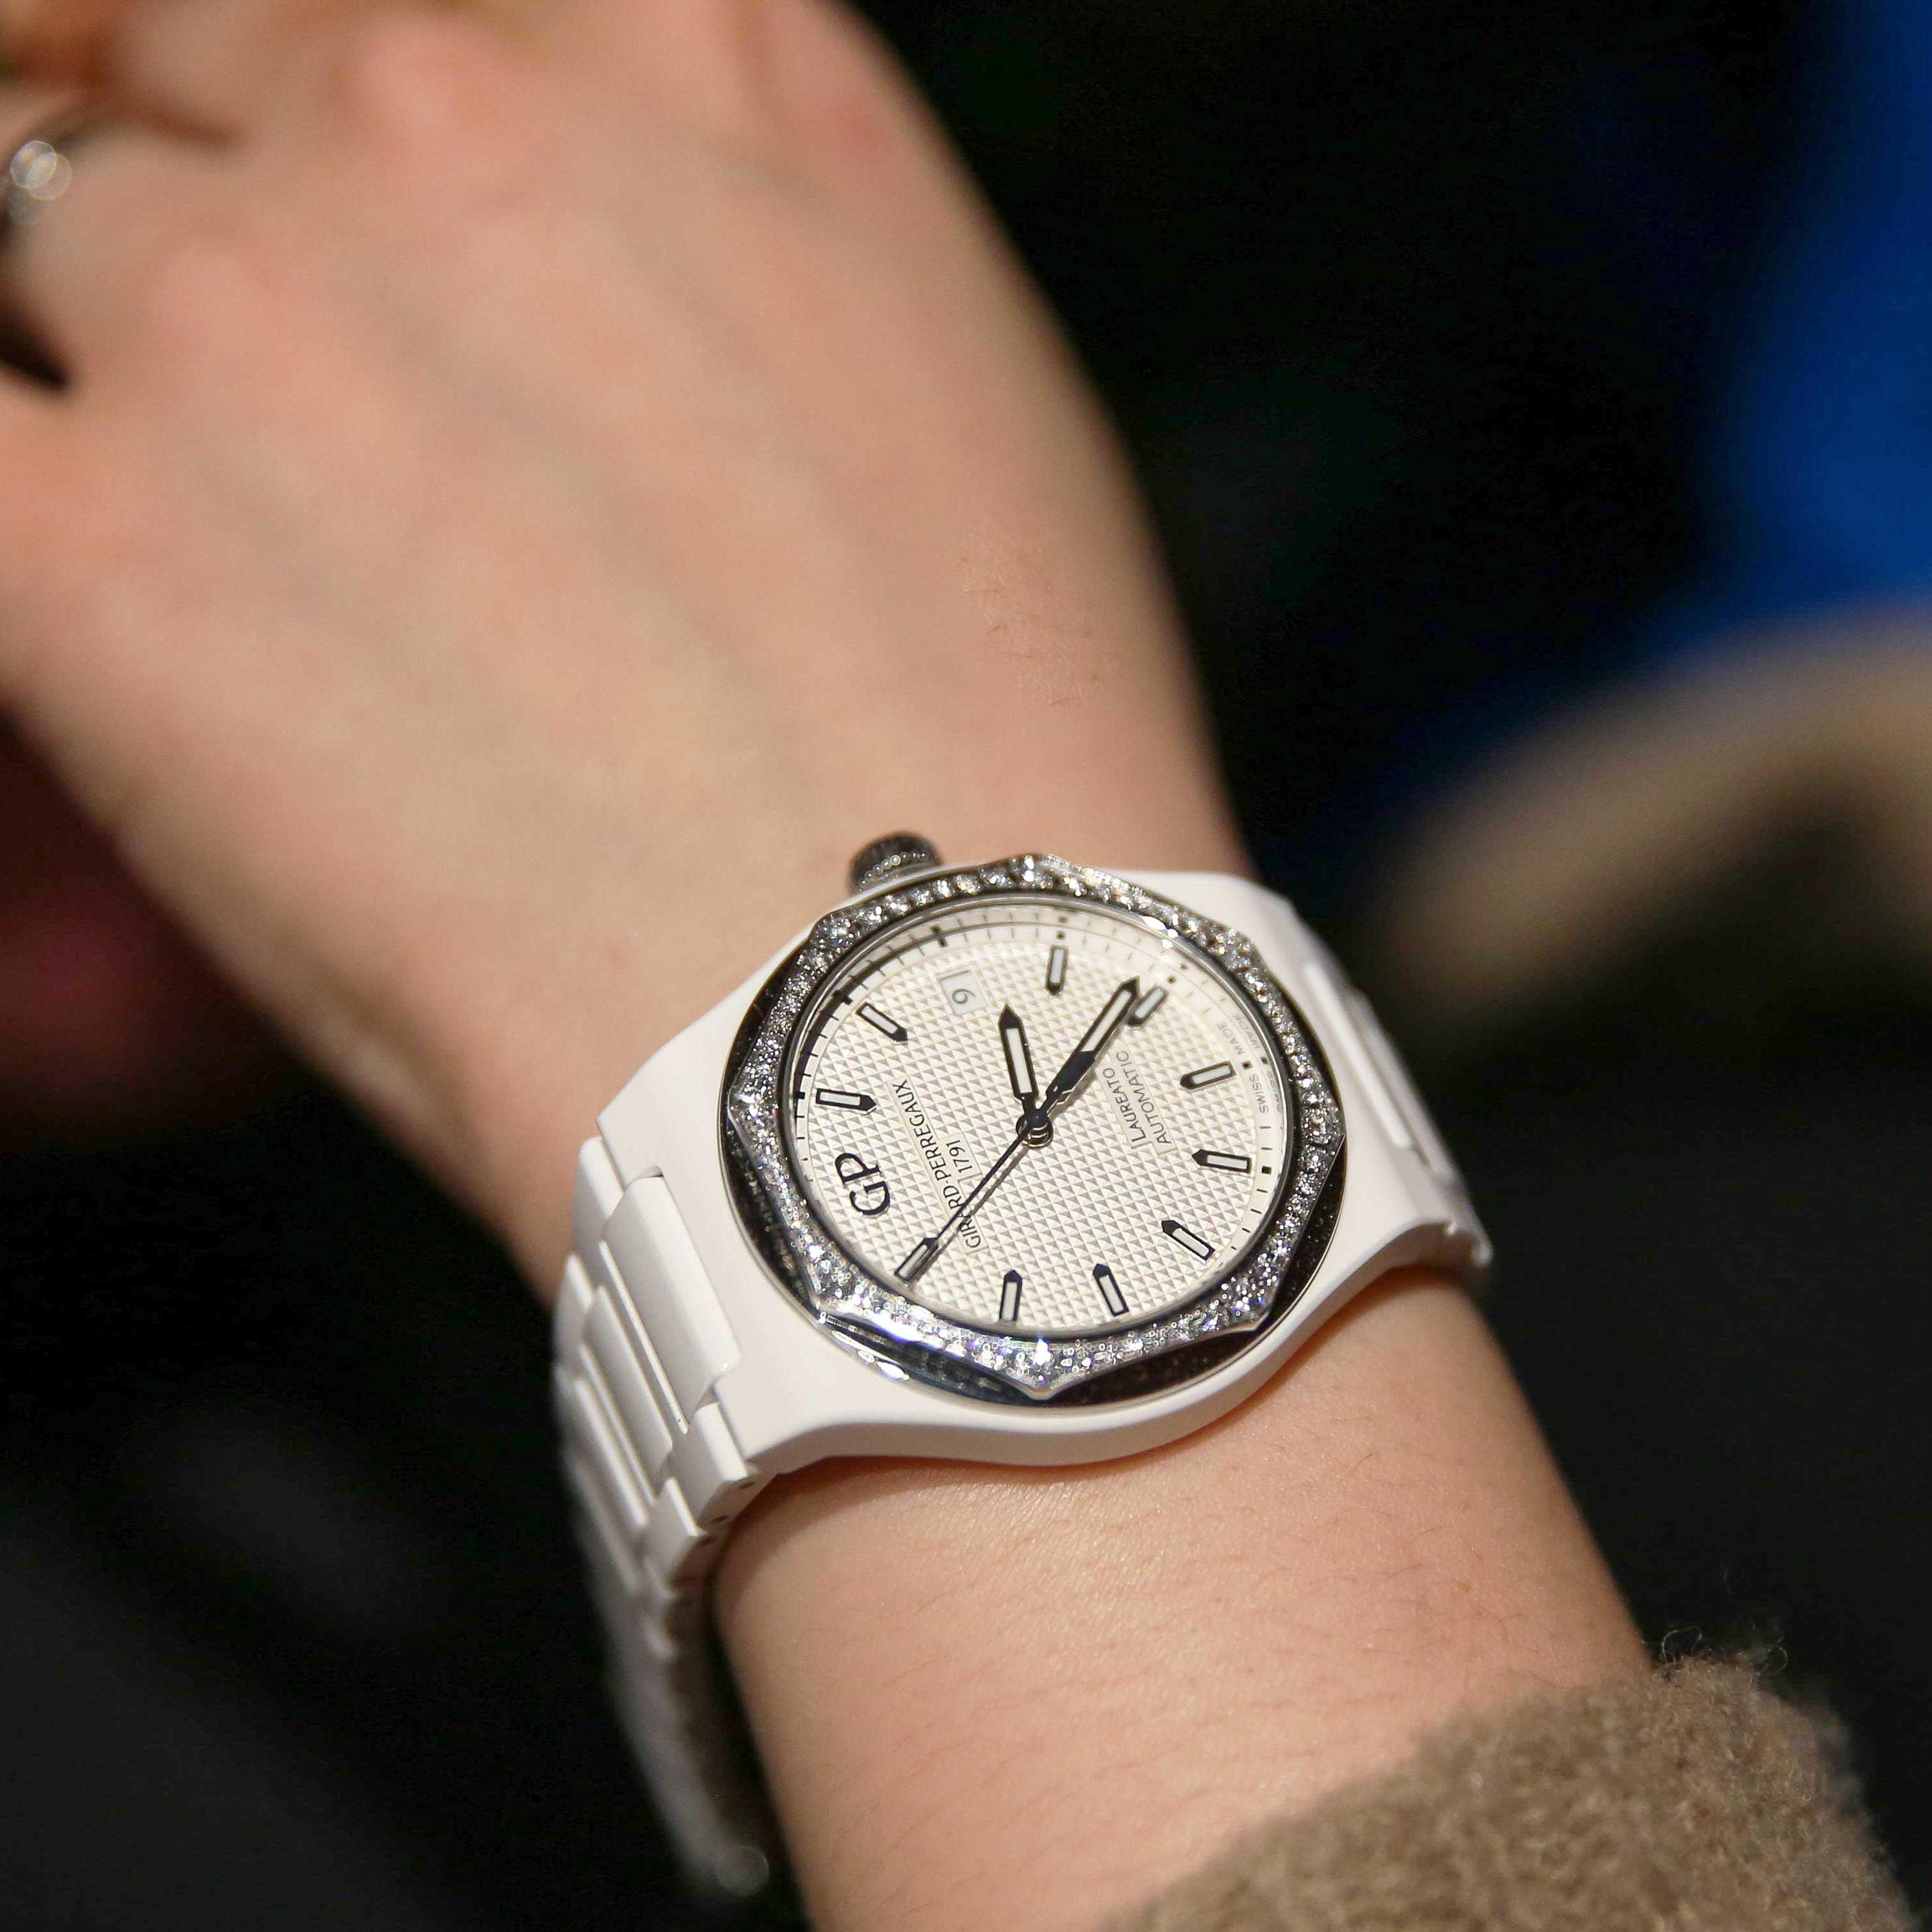 芝柏表 Laureato Ceramics桂冠系列陶瓷腕表